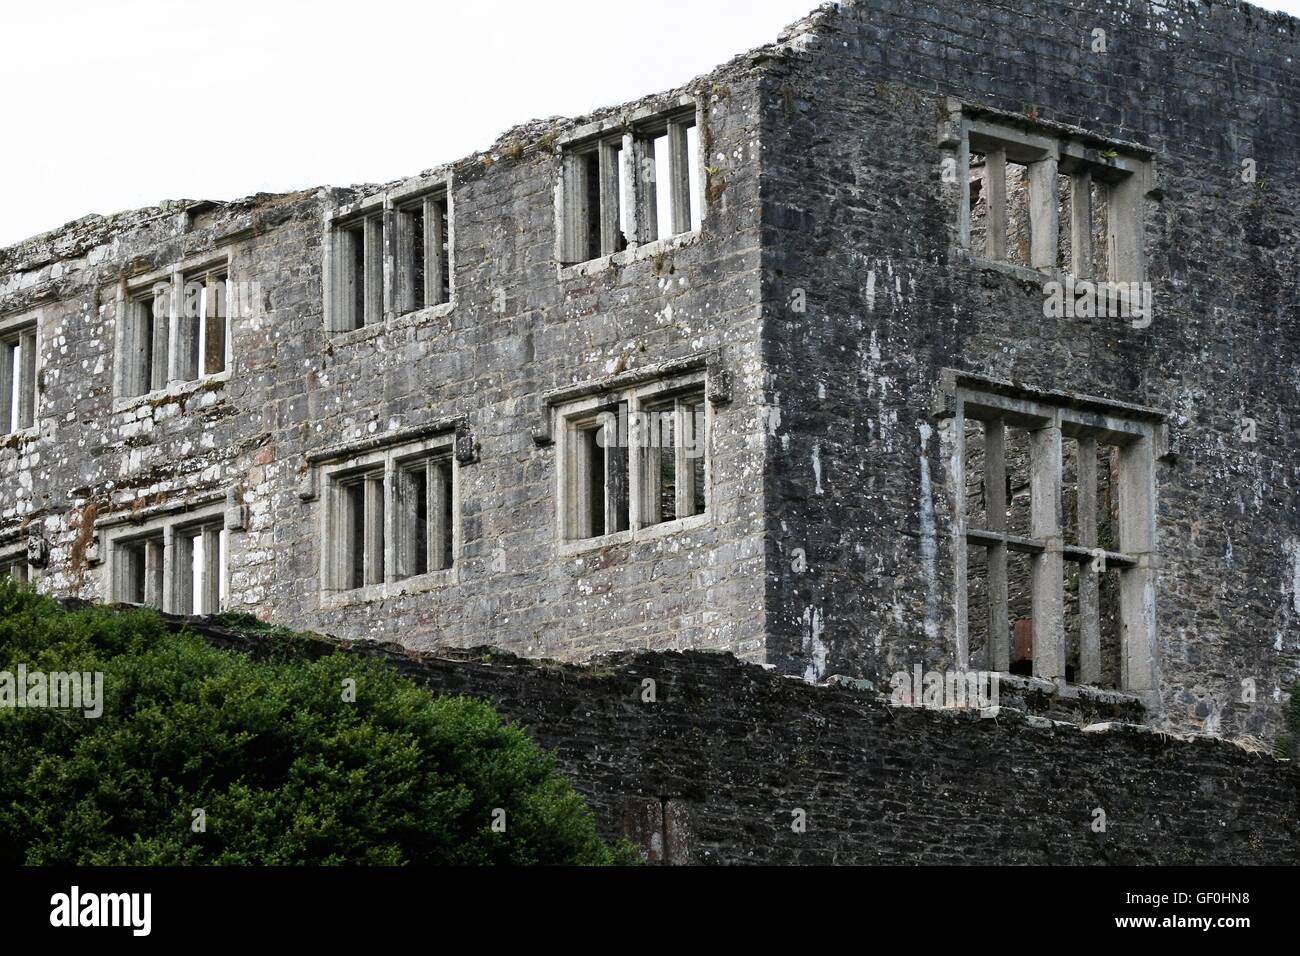 Berry Pomeroy castle - Stock Image